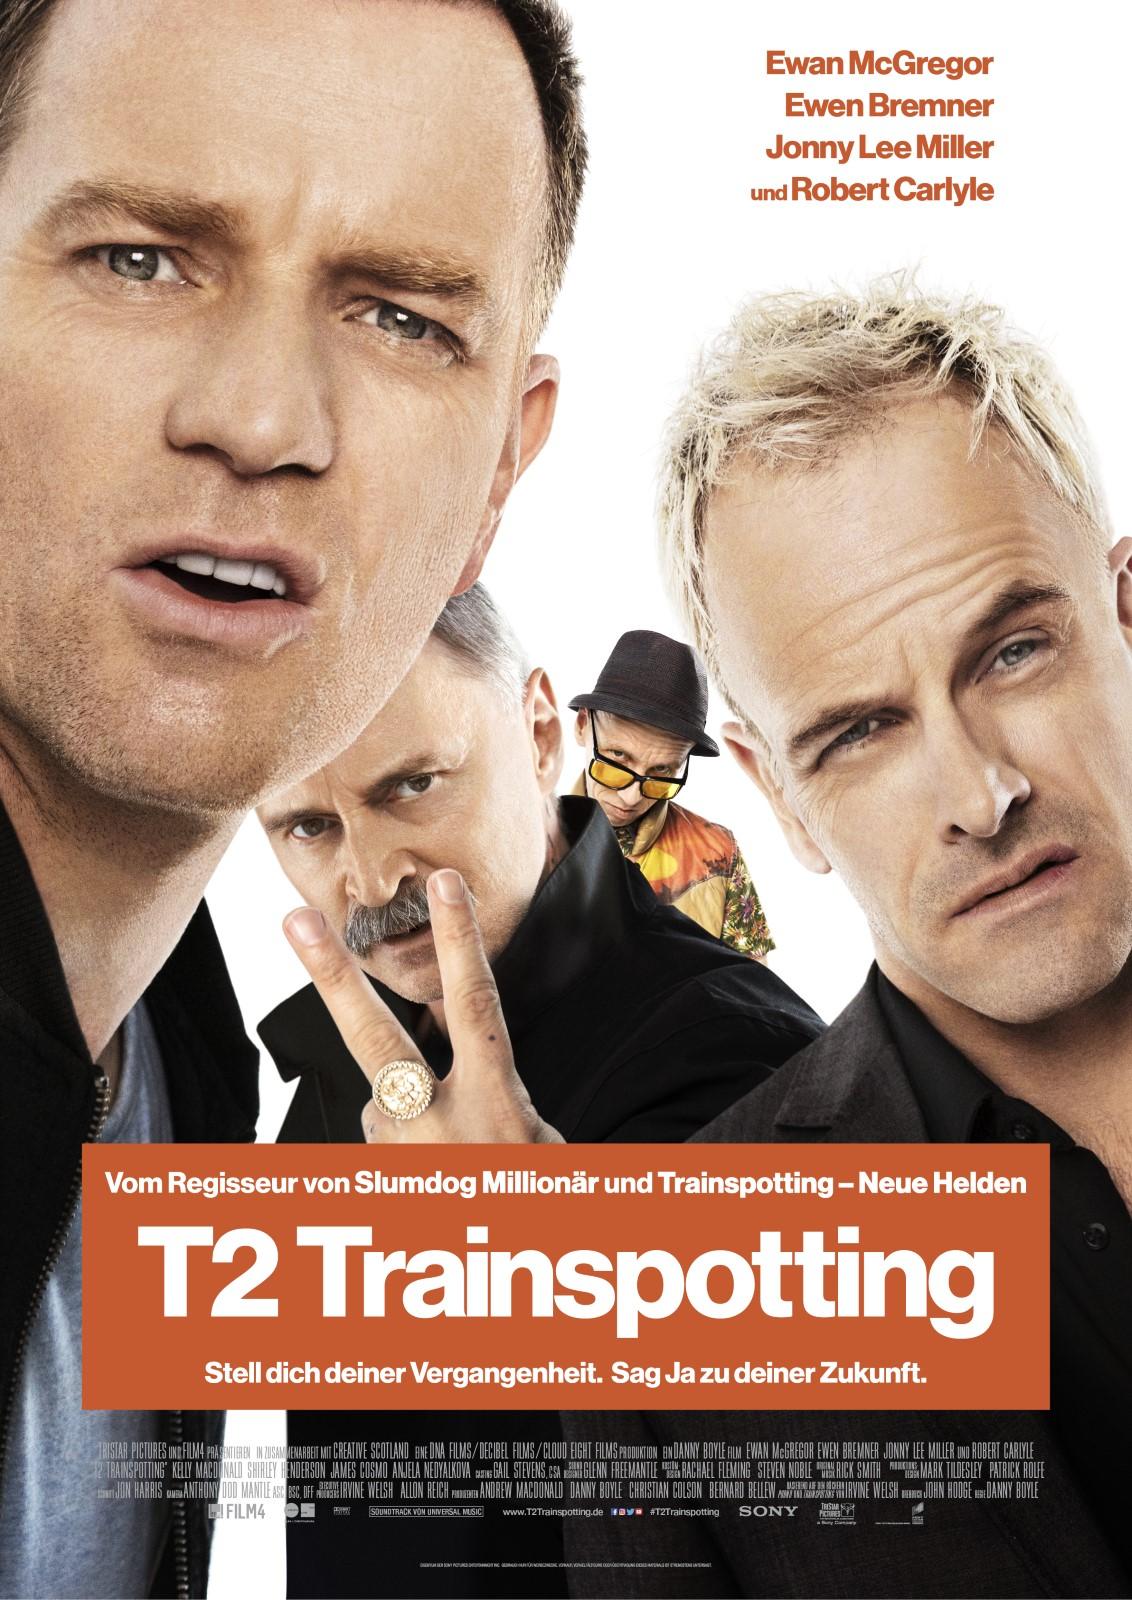 Trainspotting ähnliche Filme